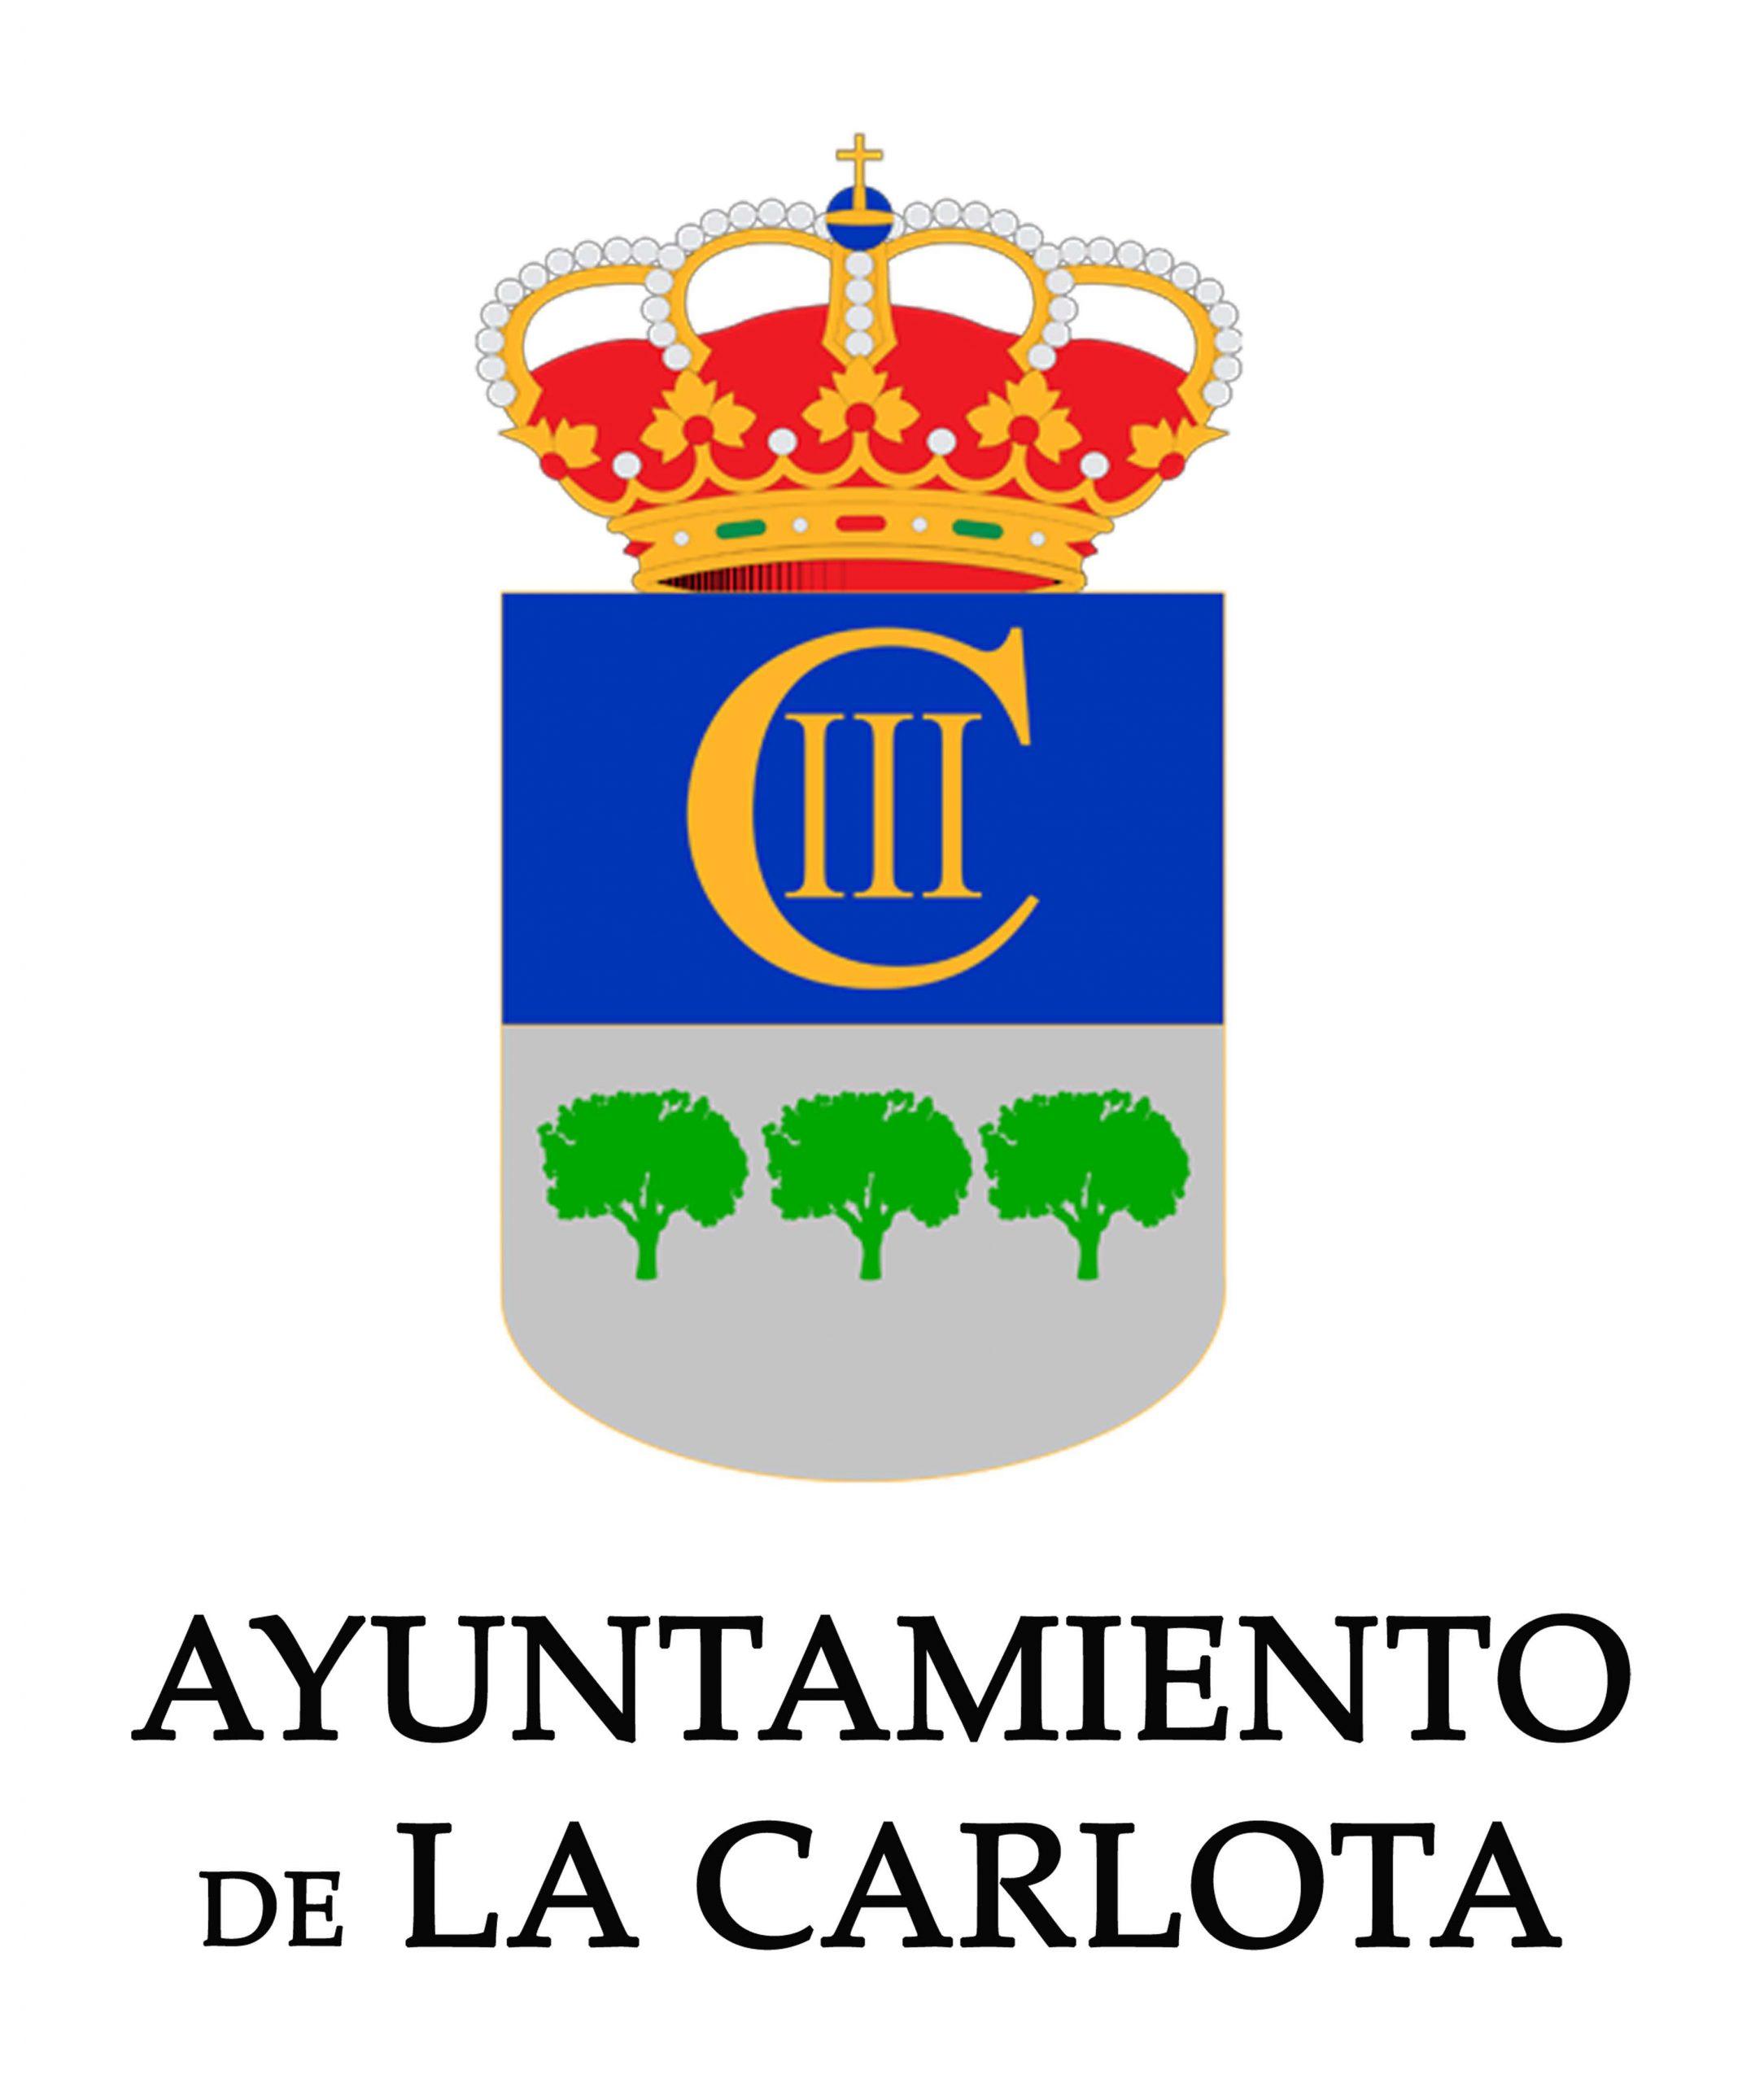 LA CARLOTA SUMA DOS CASOS POSITIVOS DE COVID-19 1